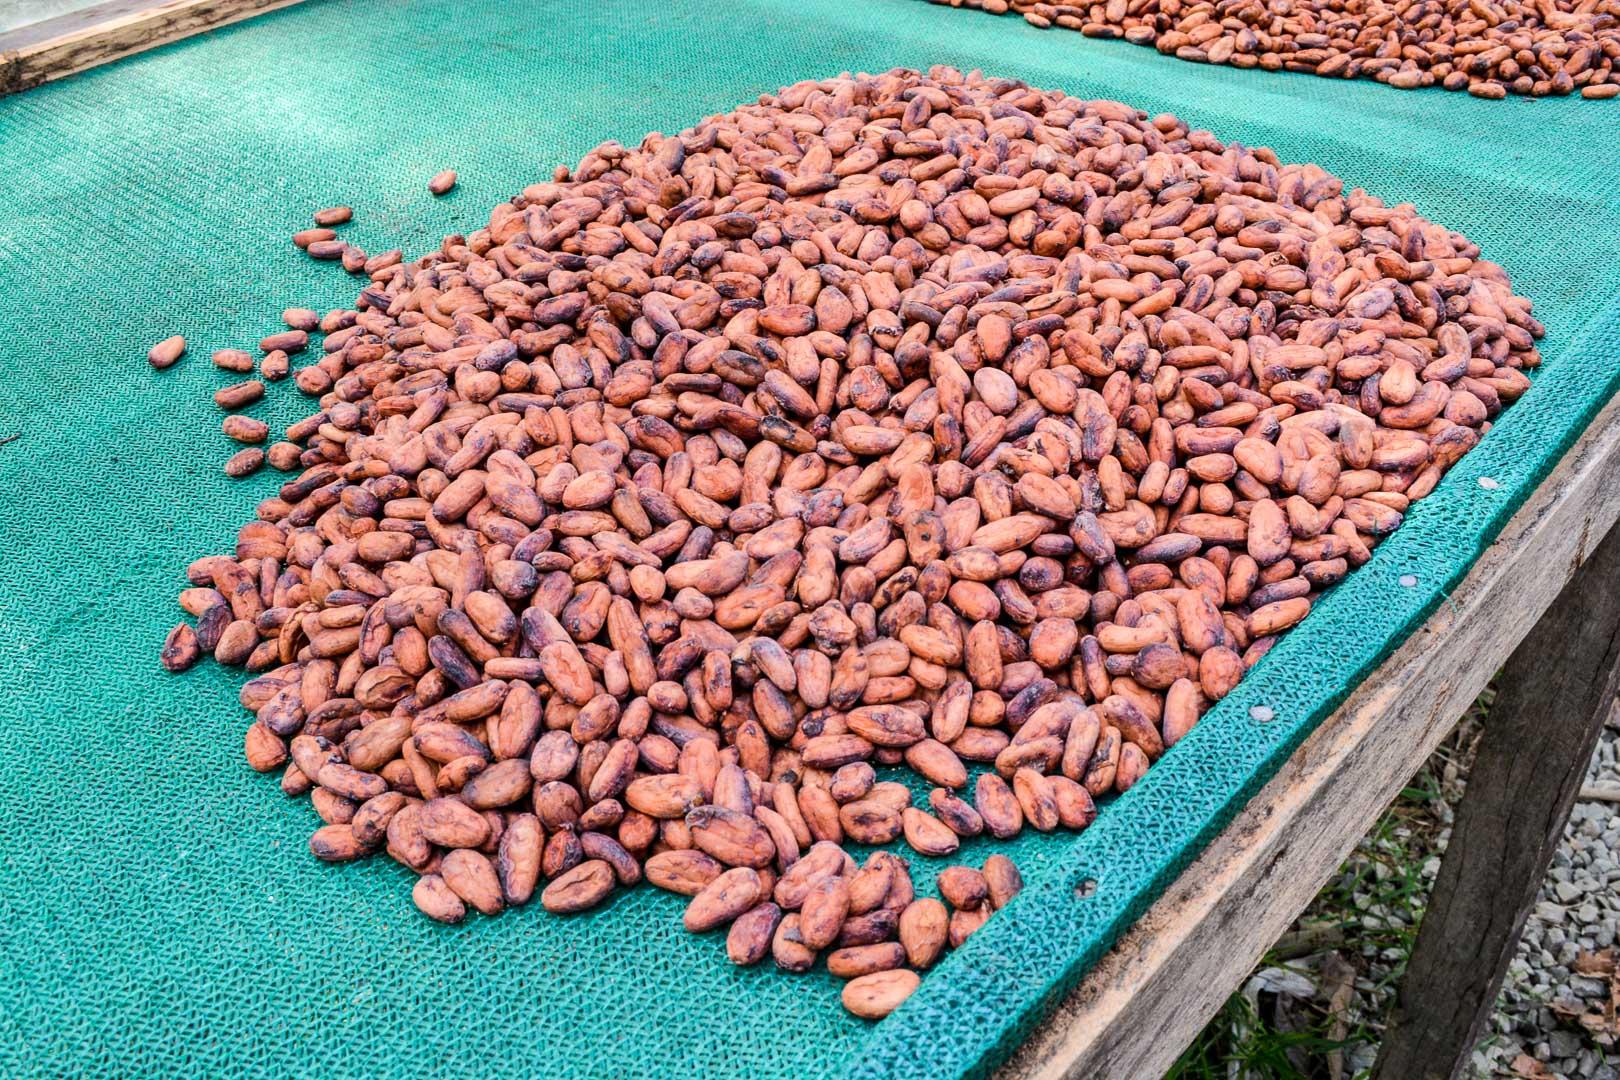 Sundried beans